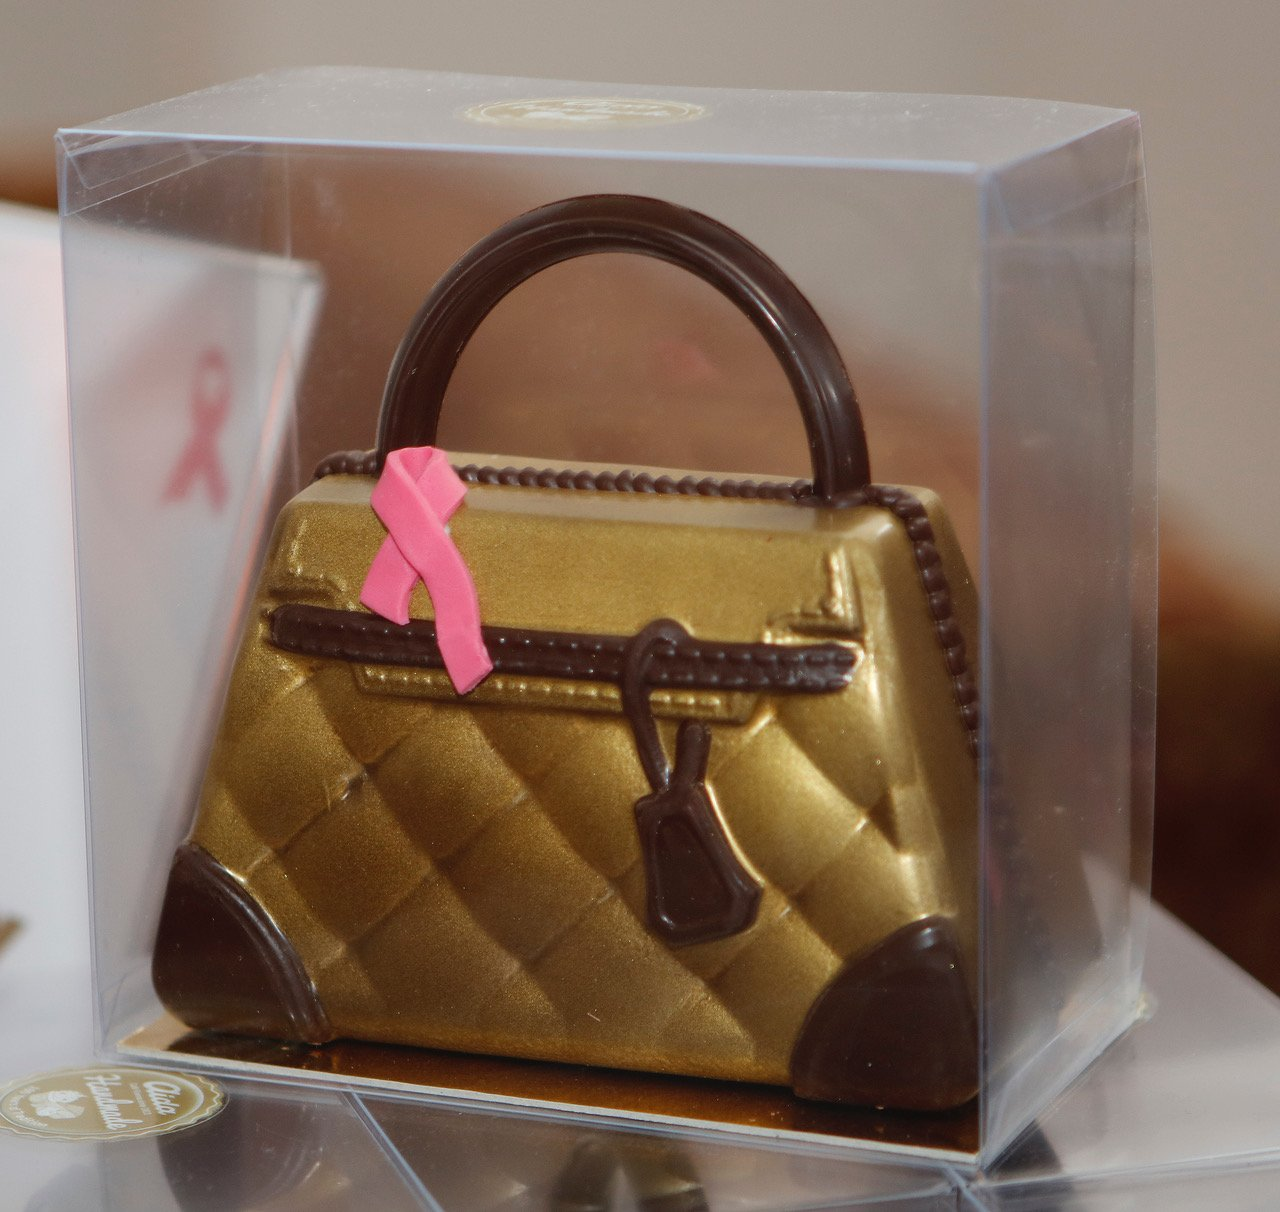 aida-pink-ribbon-schoko-tasche-gold-braun_m5s7650